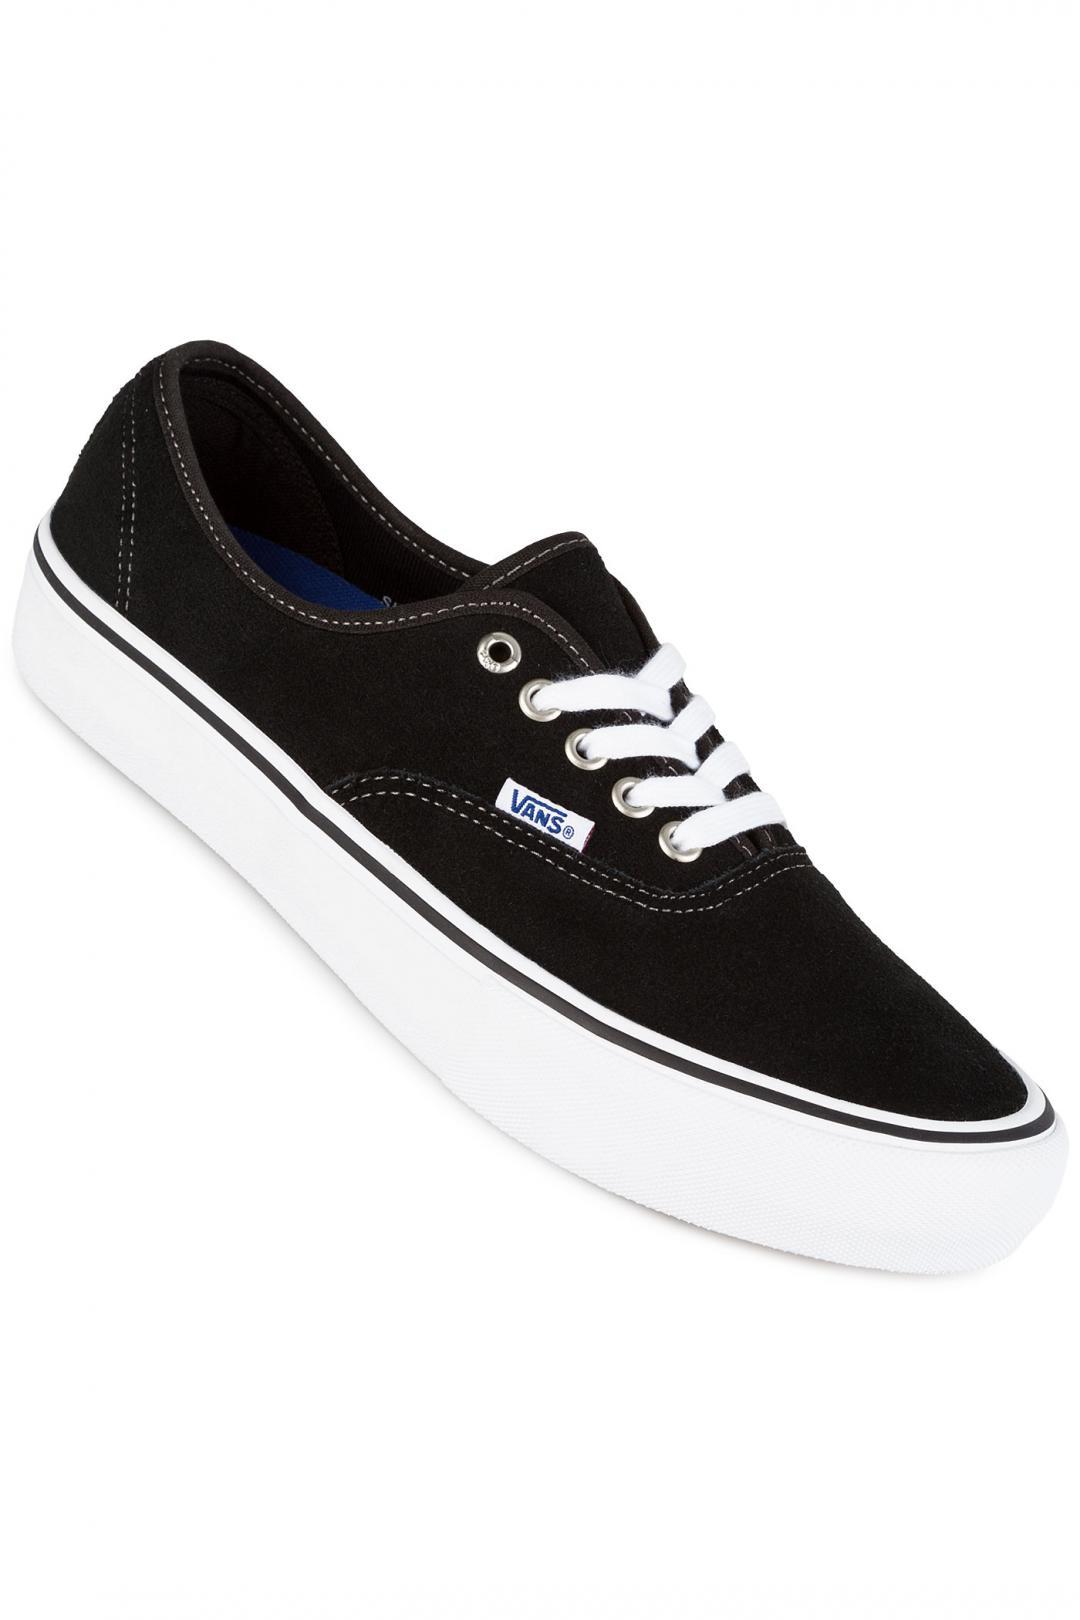 Uomo Vans Authentic Pro Suede black | Sneaker